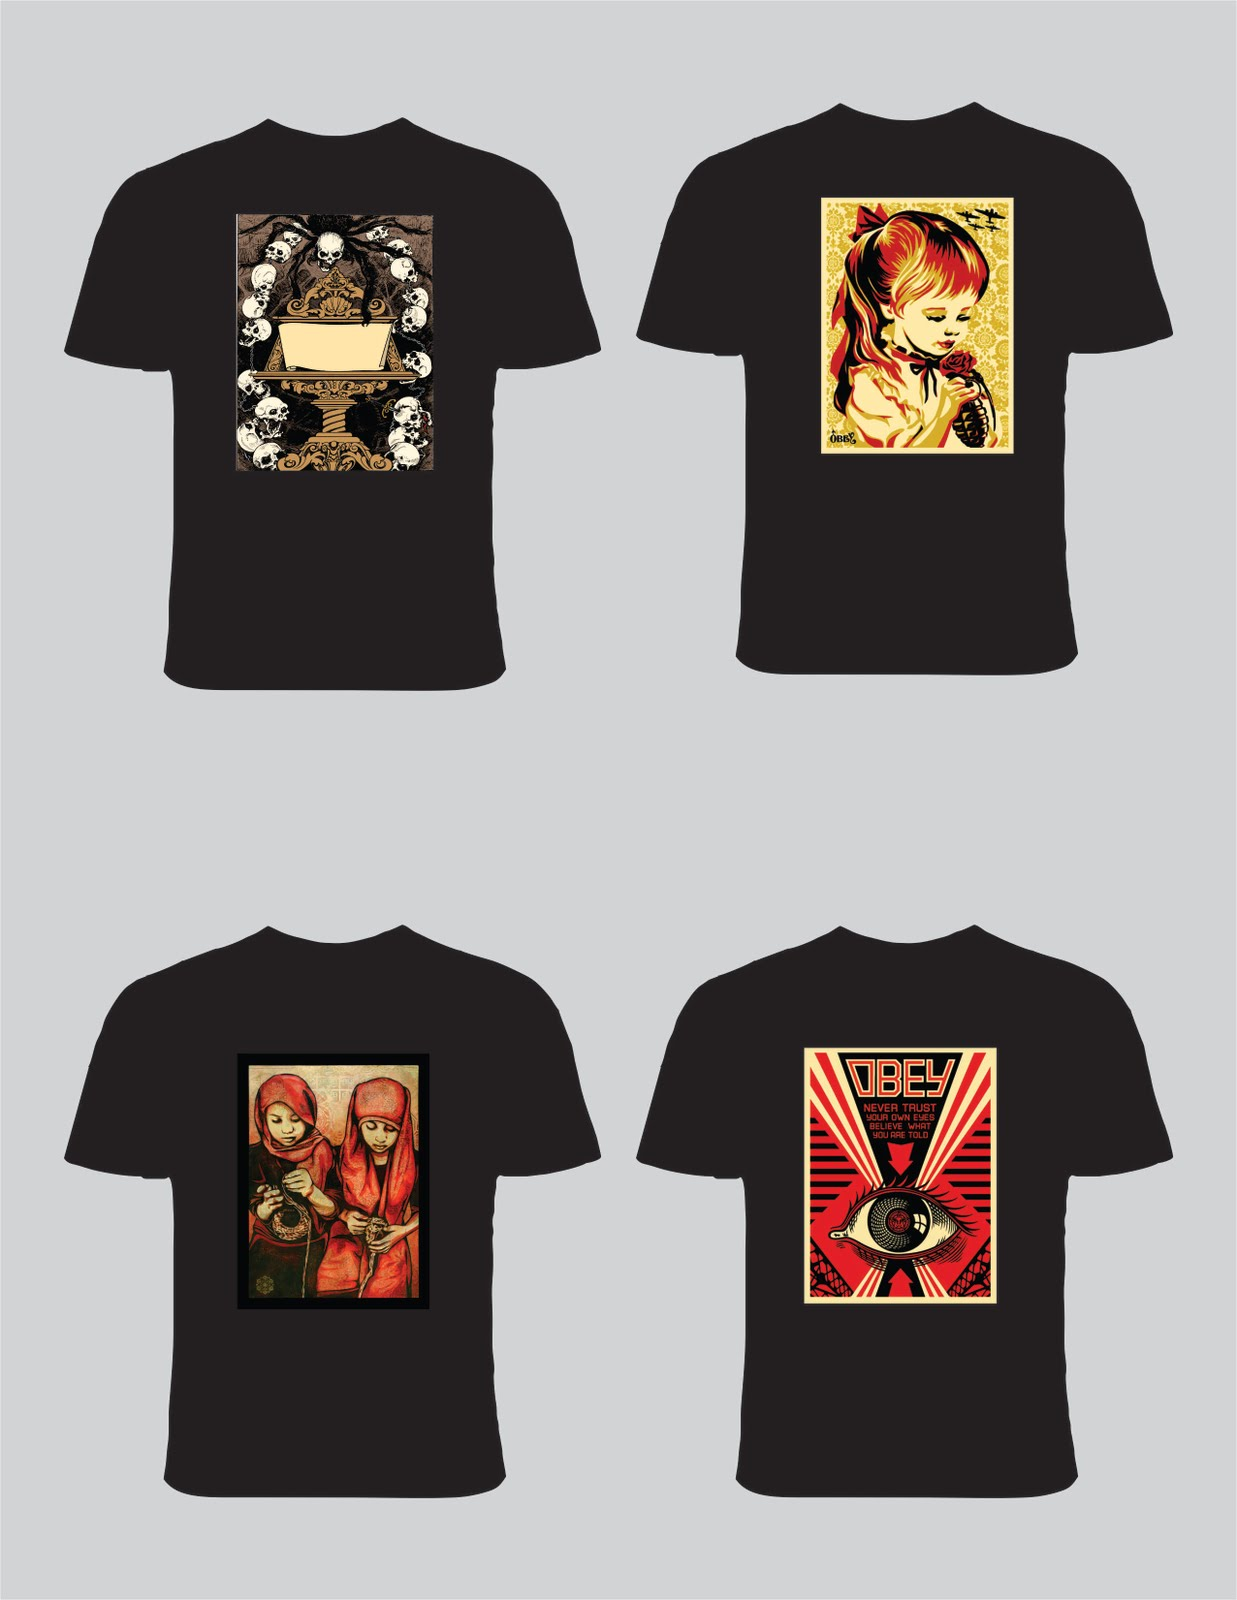 Distribuidora Libertaria Rojinegro Distribuidora Camisetas Rojinegro Catálogo S1wfq8x